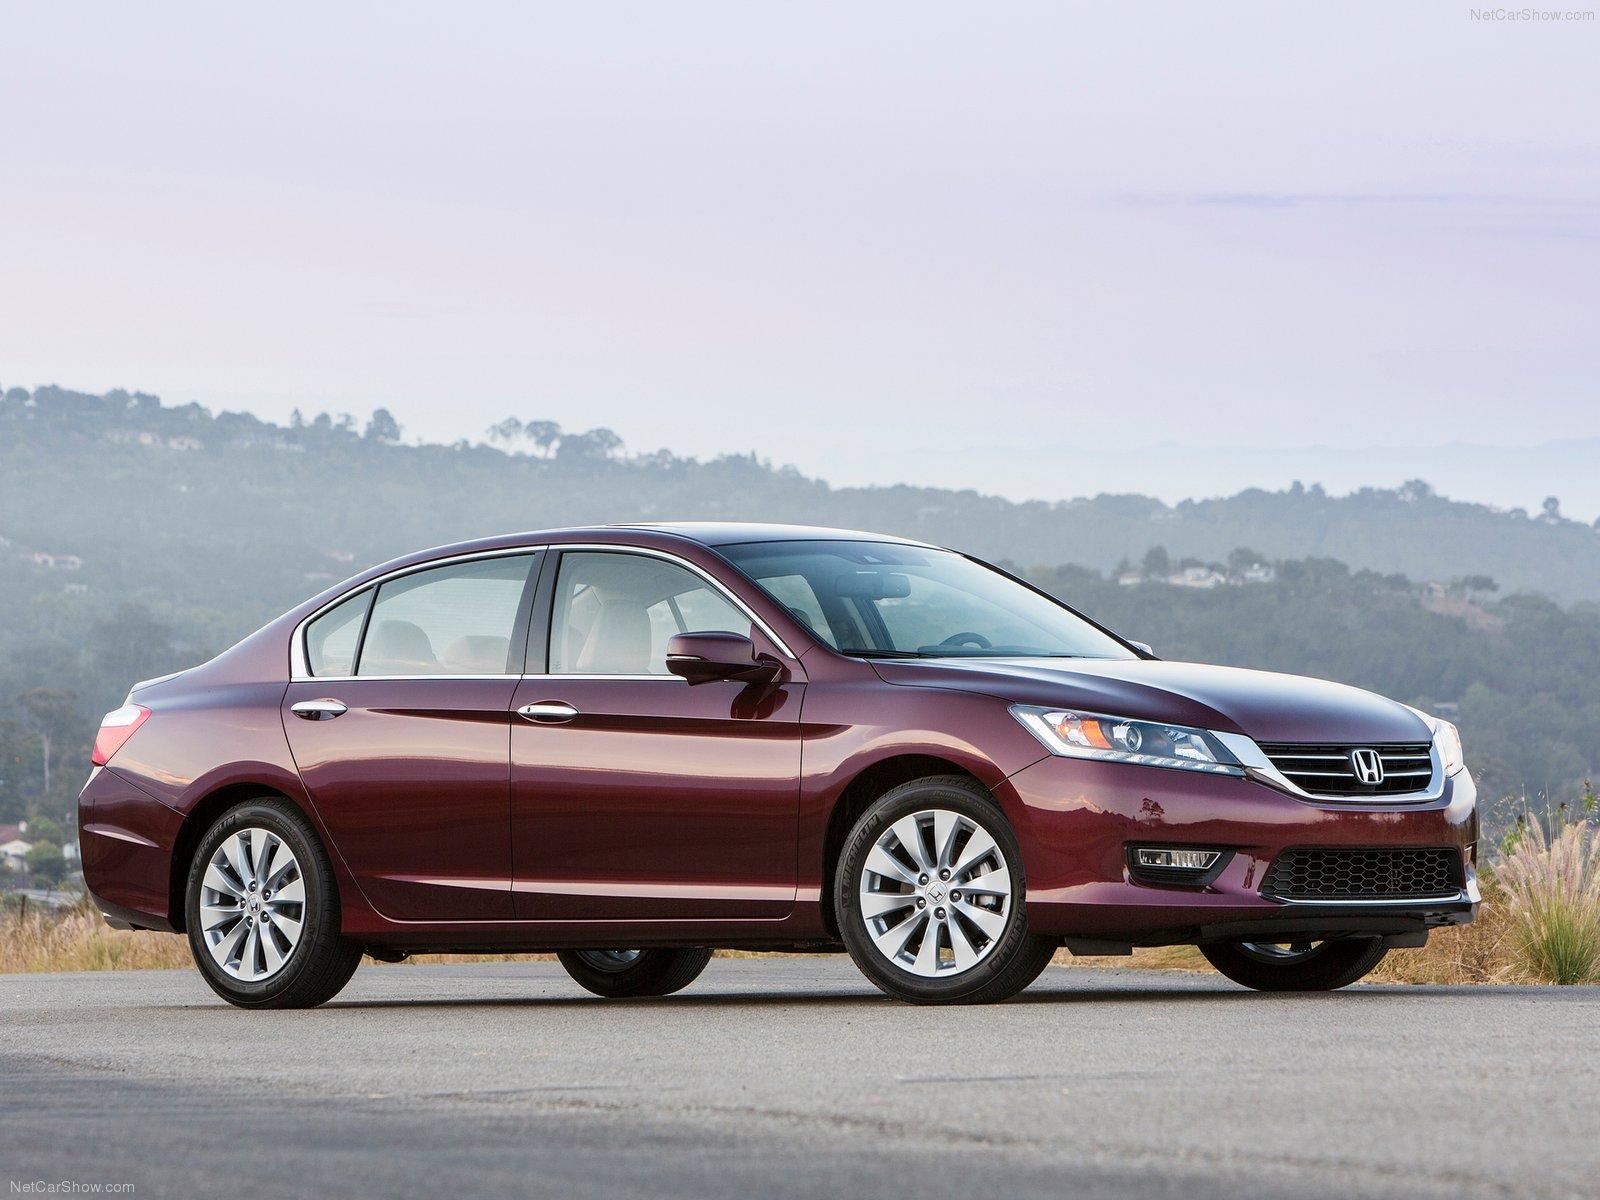 Wheels For Honda Accord U003eu003e Tuning Honda Accord Sedan 2013 Online,  Accessories And Spare